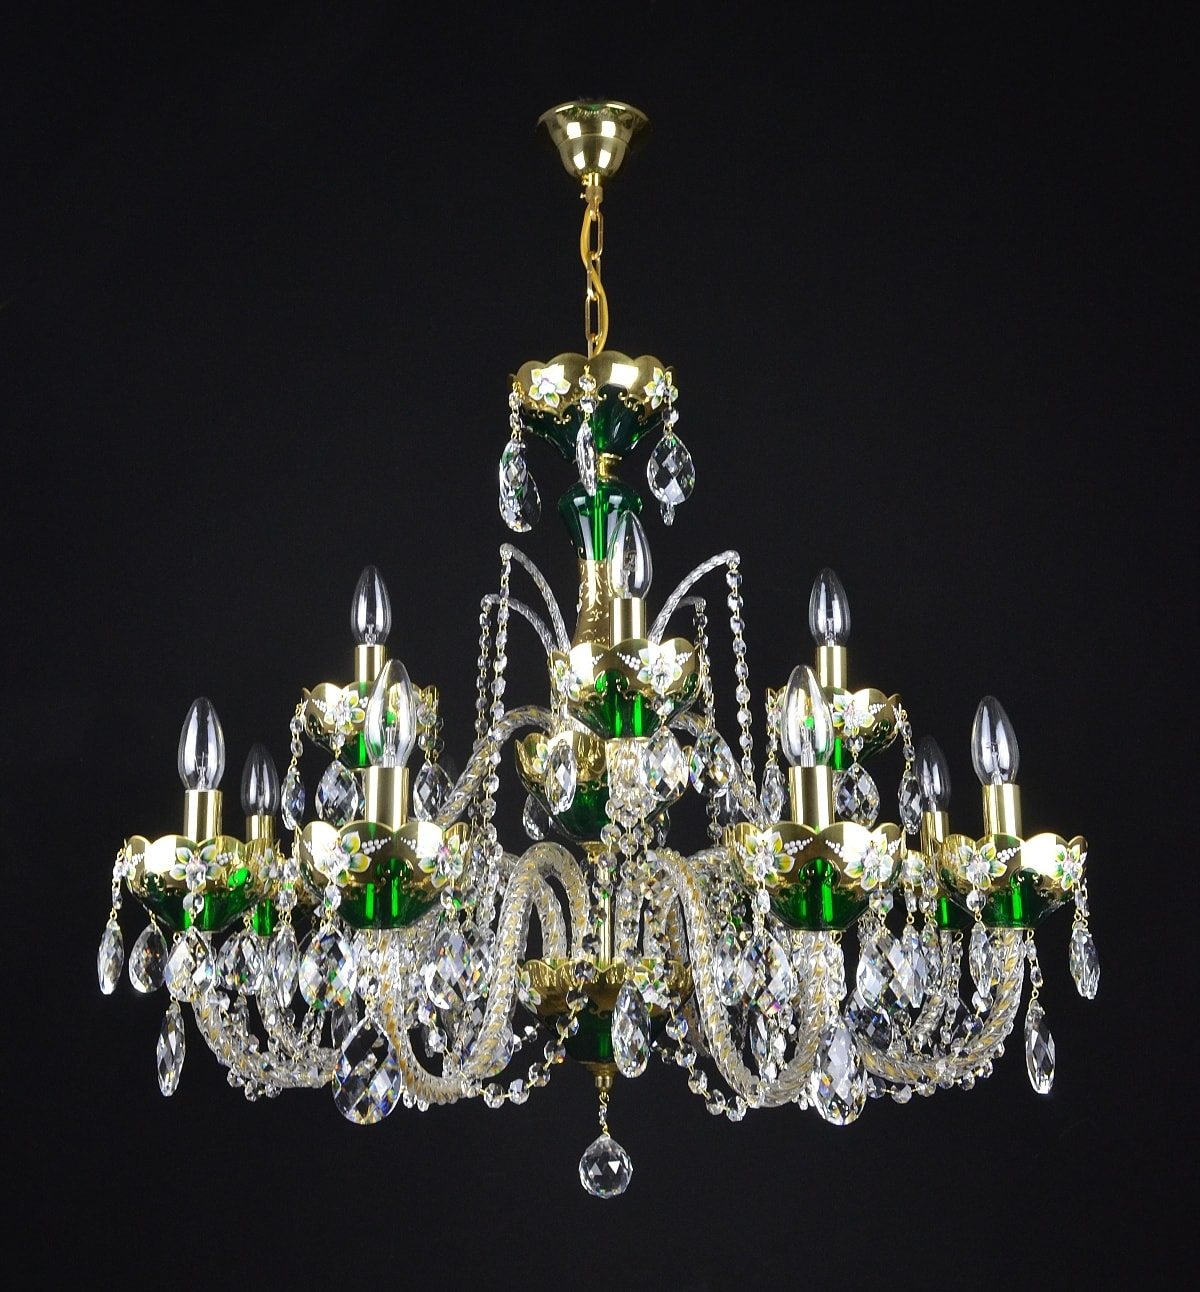 green-crystal-chandelier.jpg